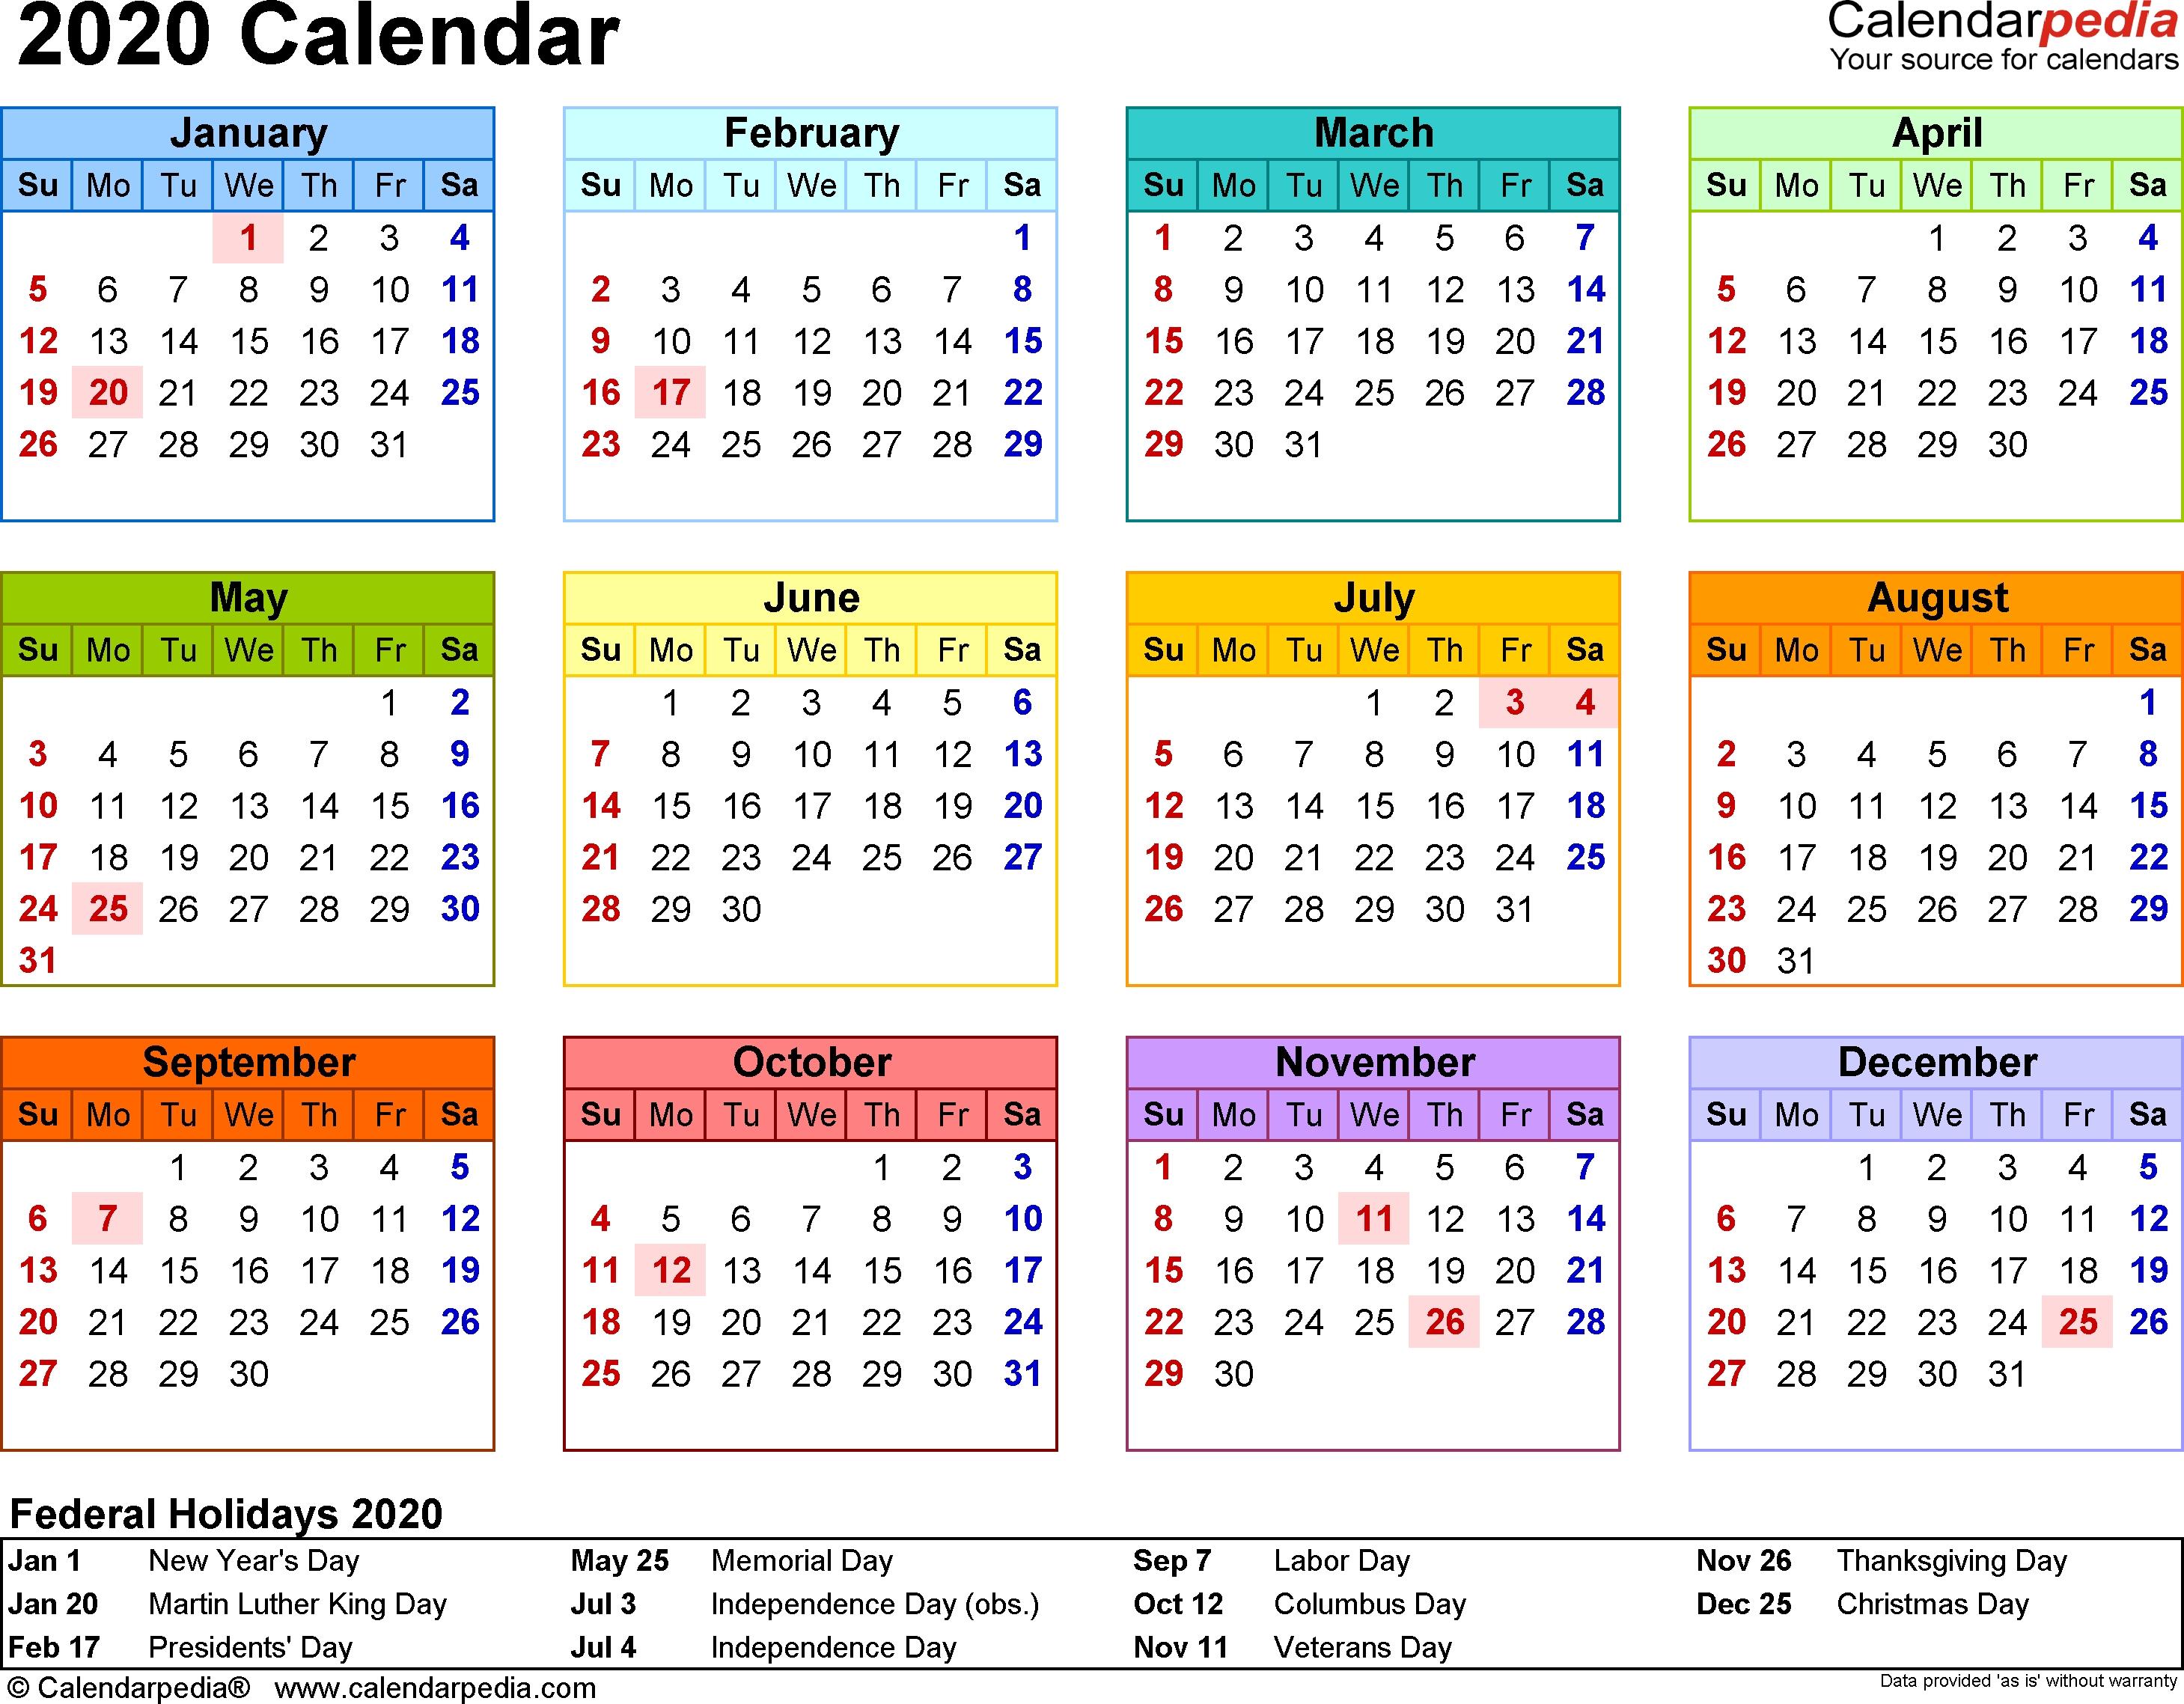 2020 Calendar - 18 Free Printable Word Calendar Templates-Free 2 Page Calendar Templates 2020